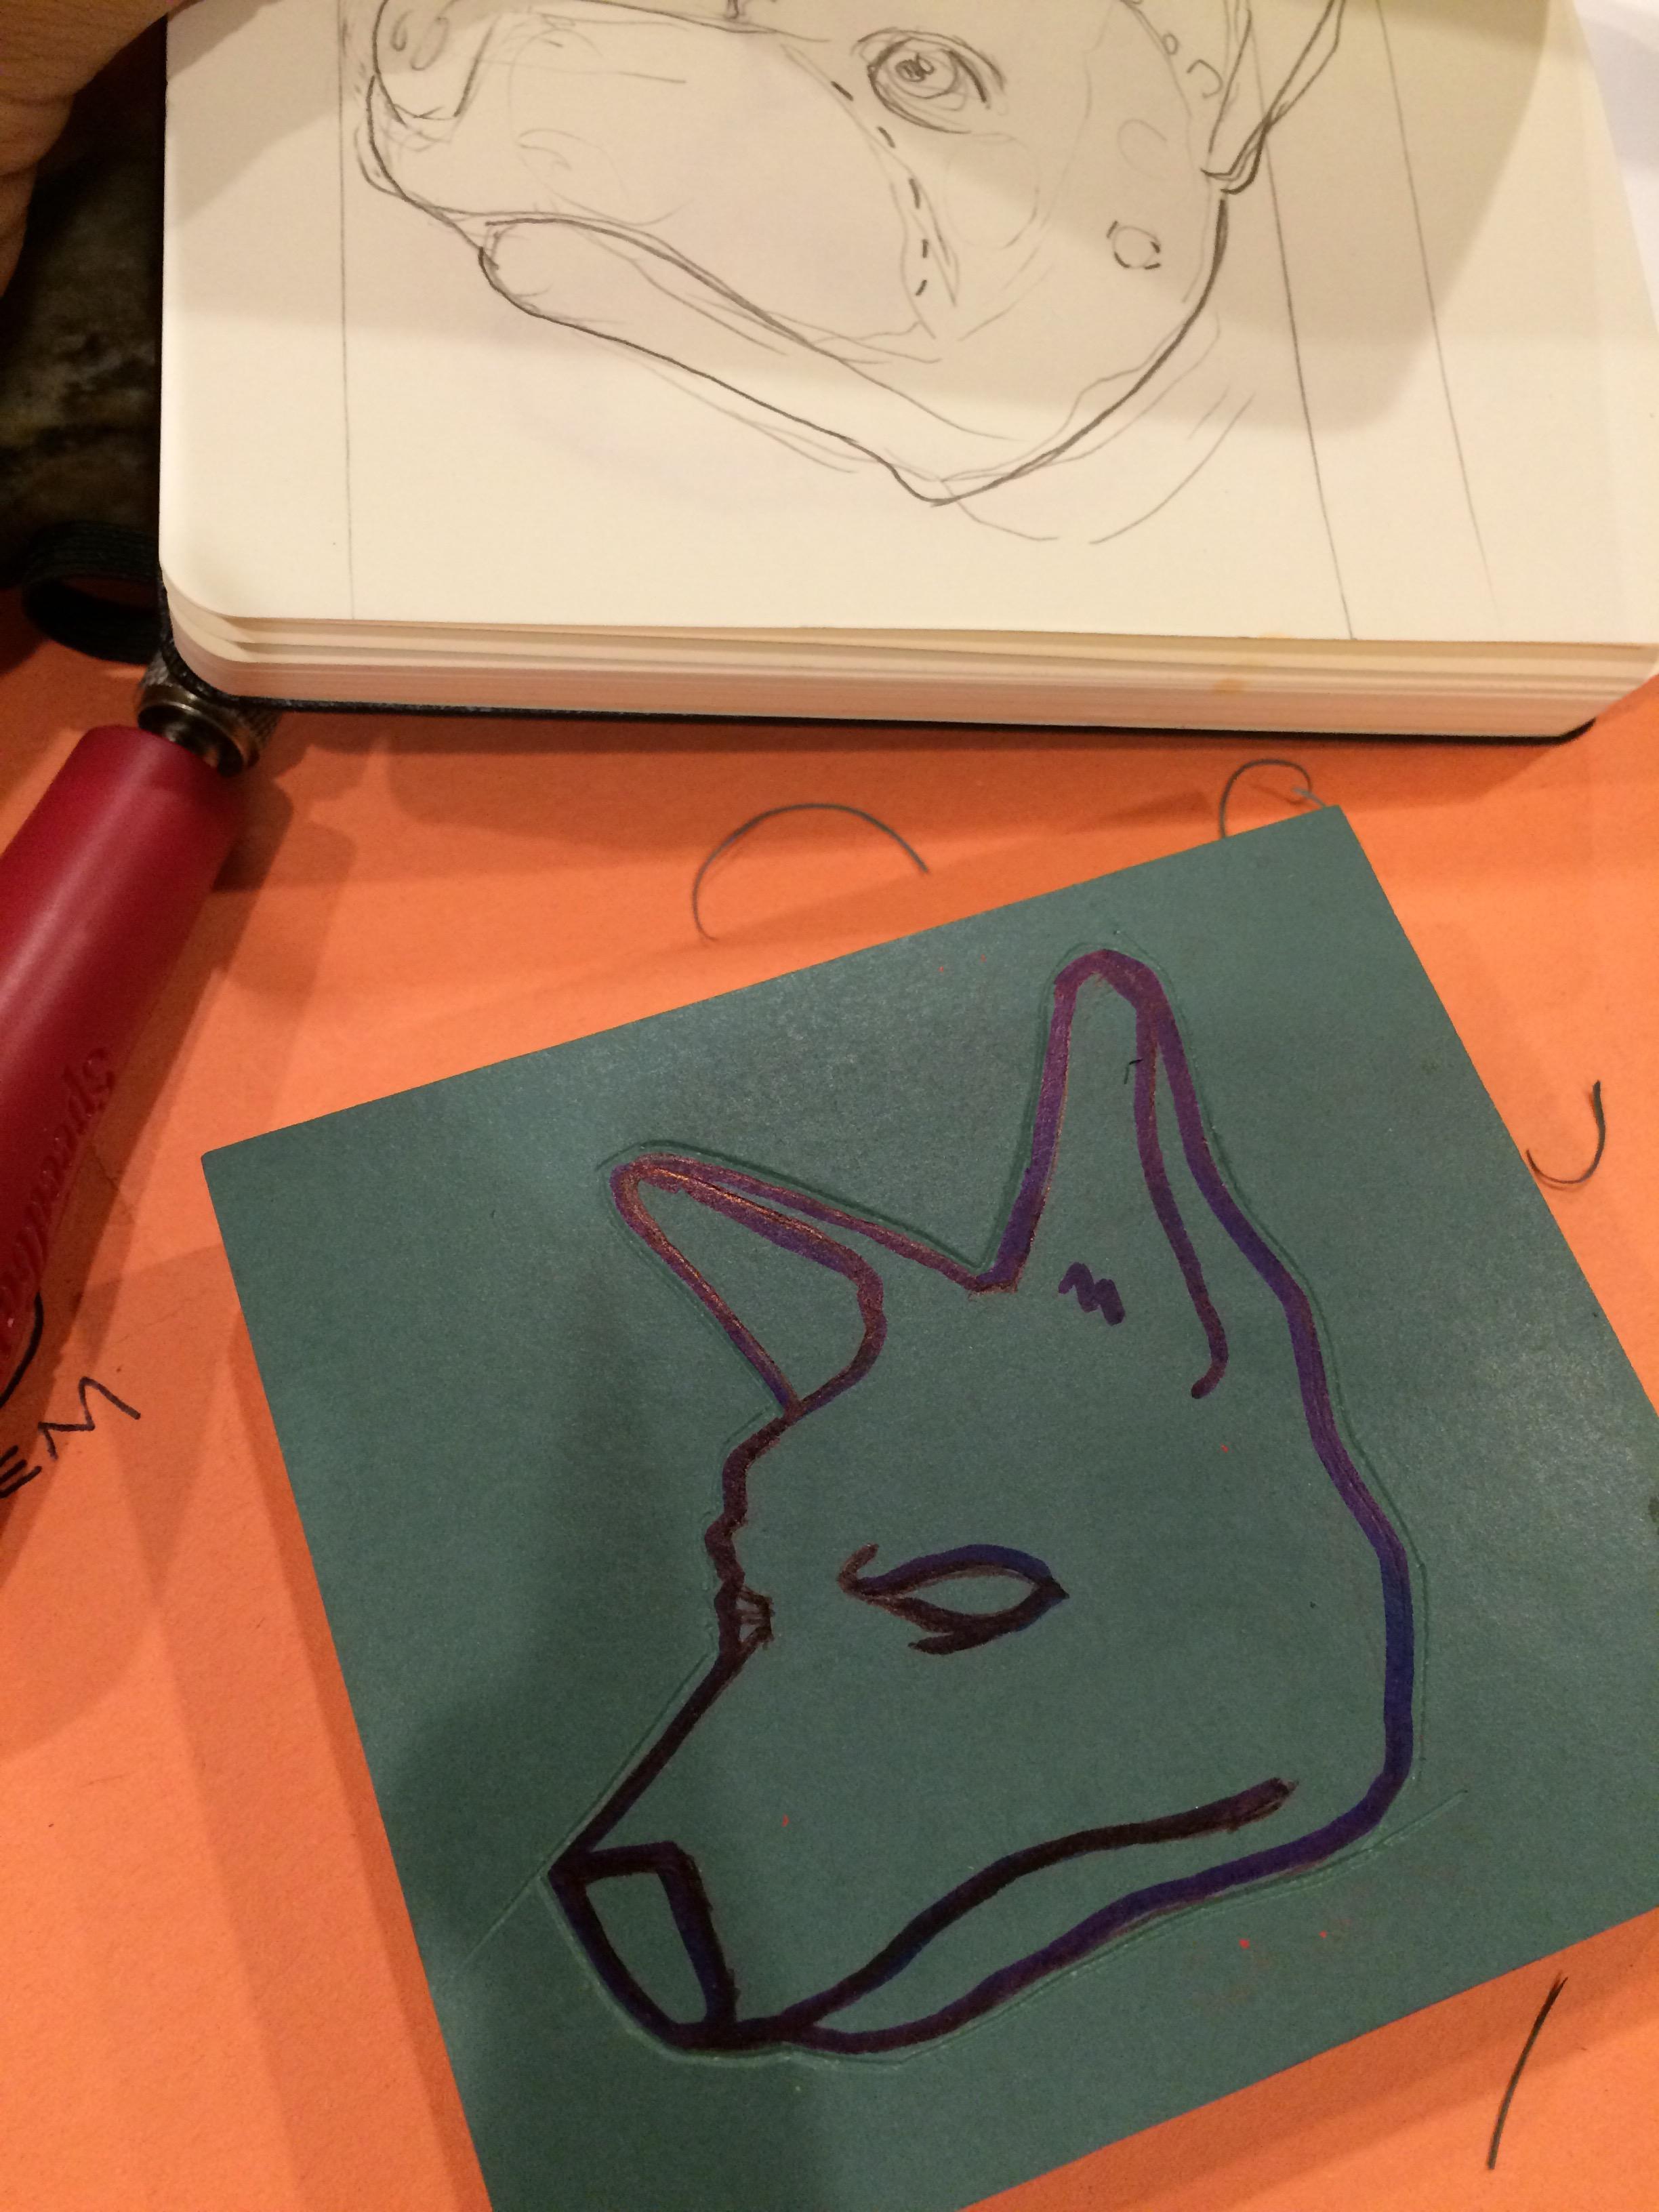 The sketch, transferred to the linoleum block.